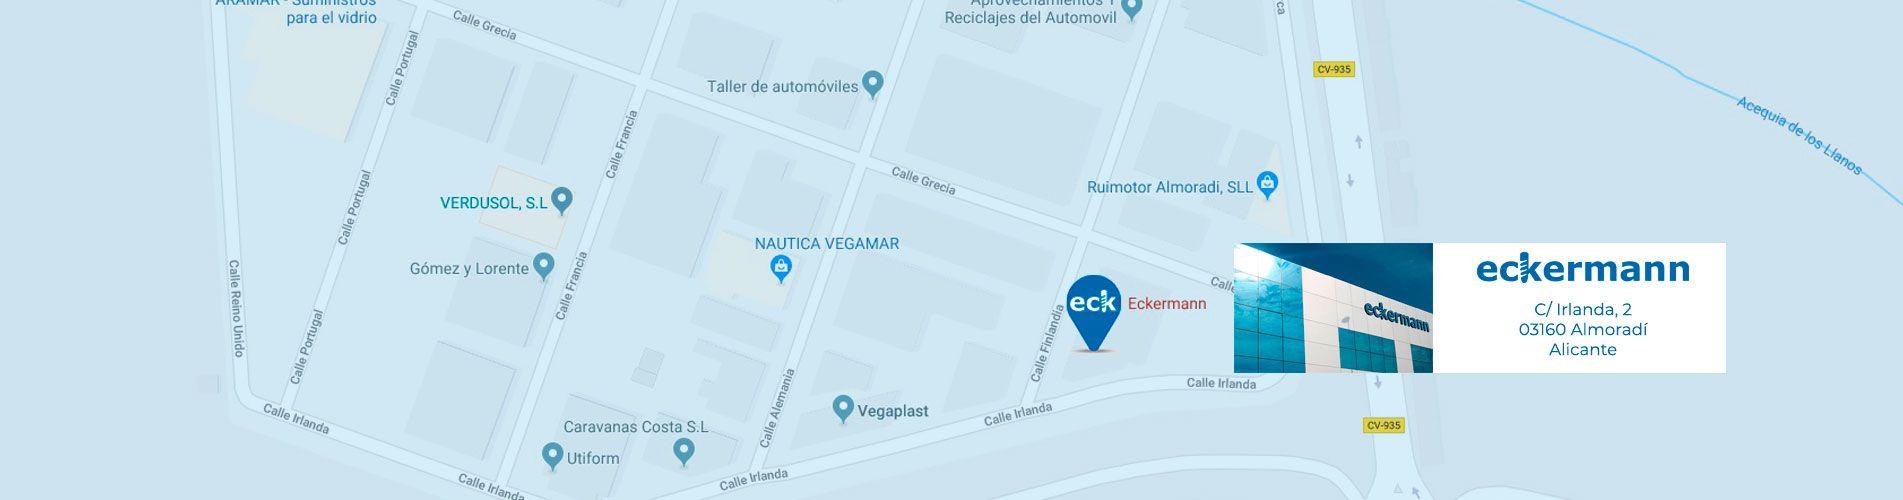 Contacta con Eckermann Dental Implant System